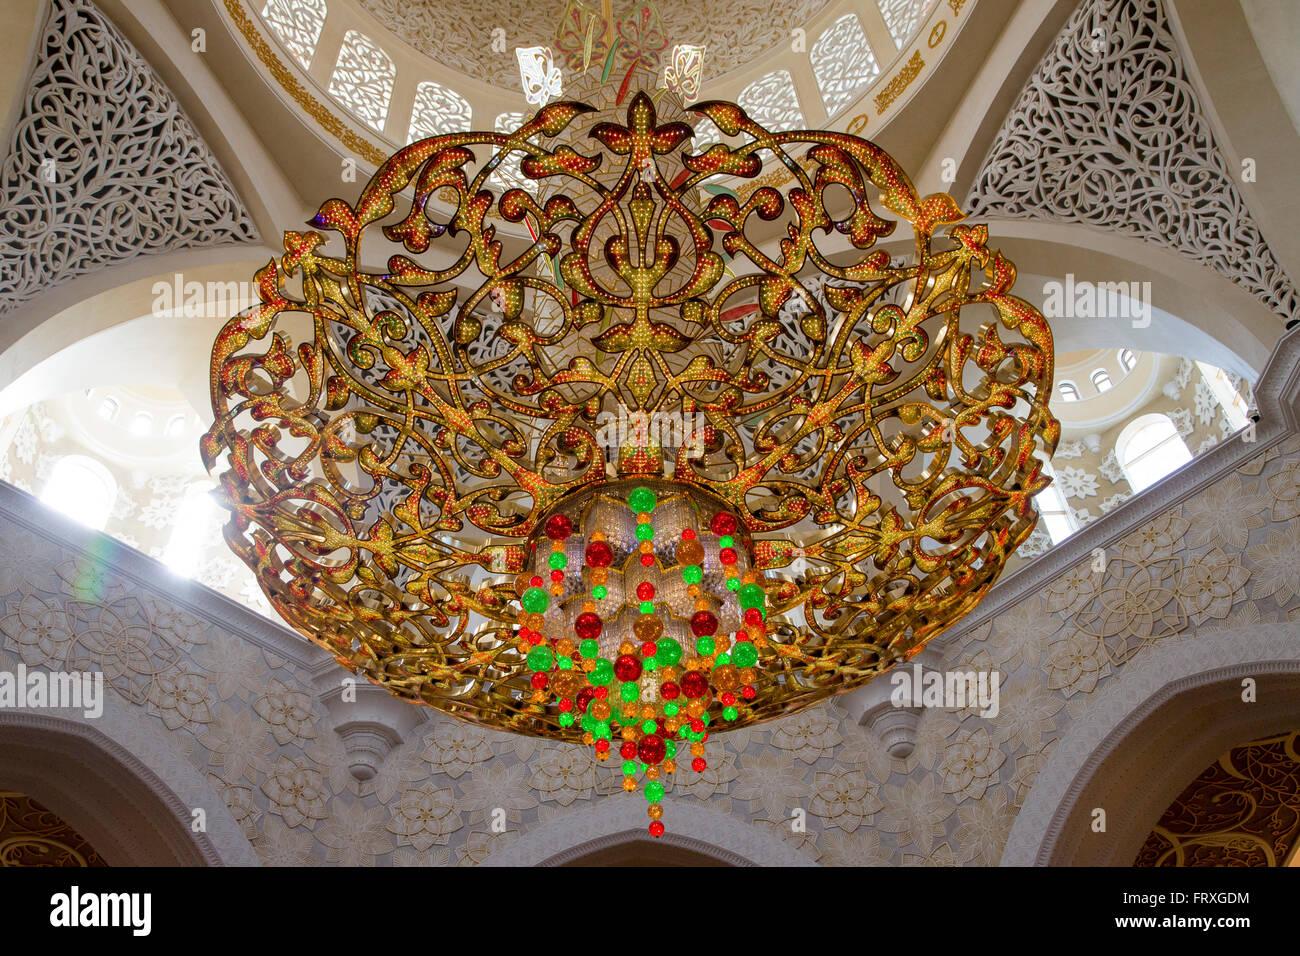 Chandelier inside the Sheikh Zayed Bin Sultan Al Nahyan Grand ...